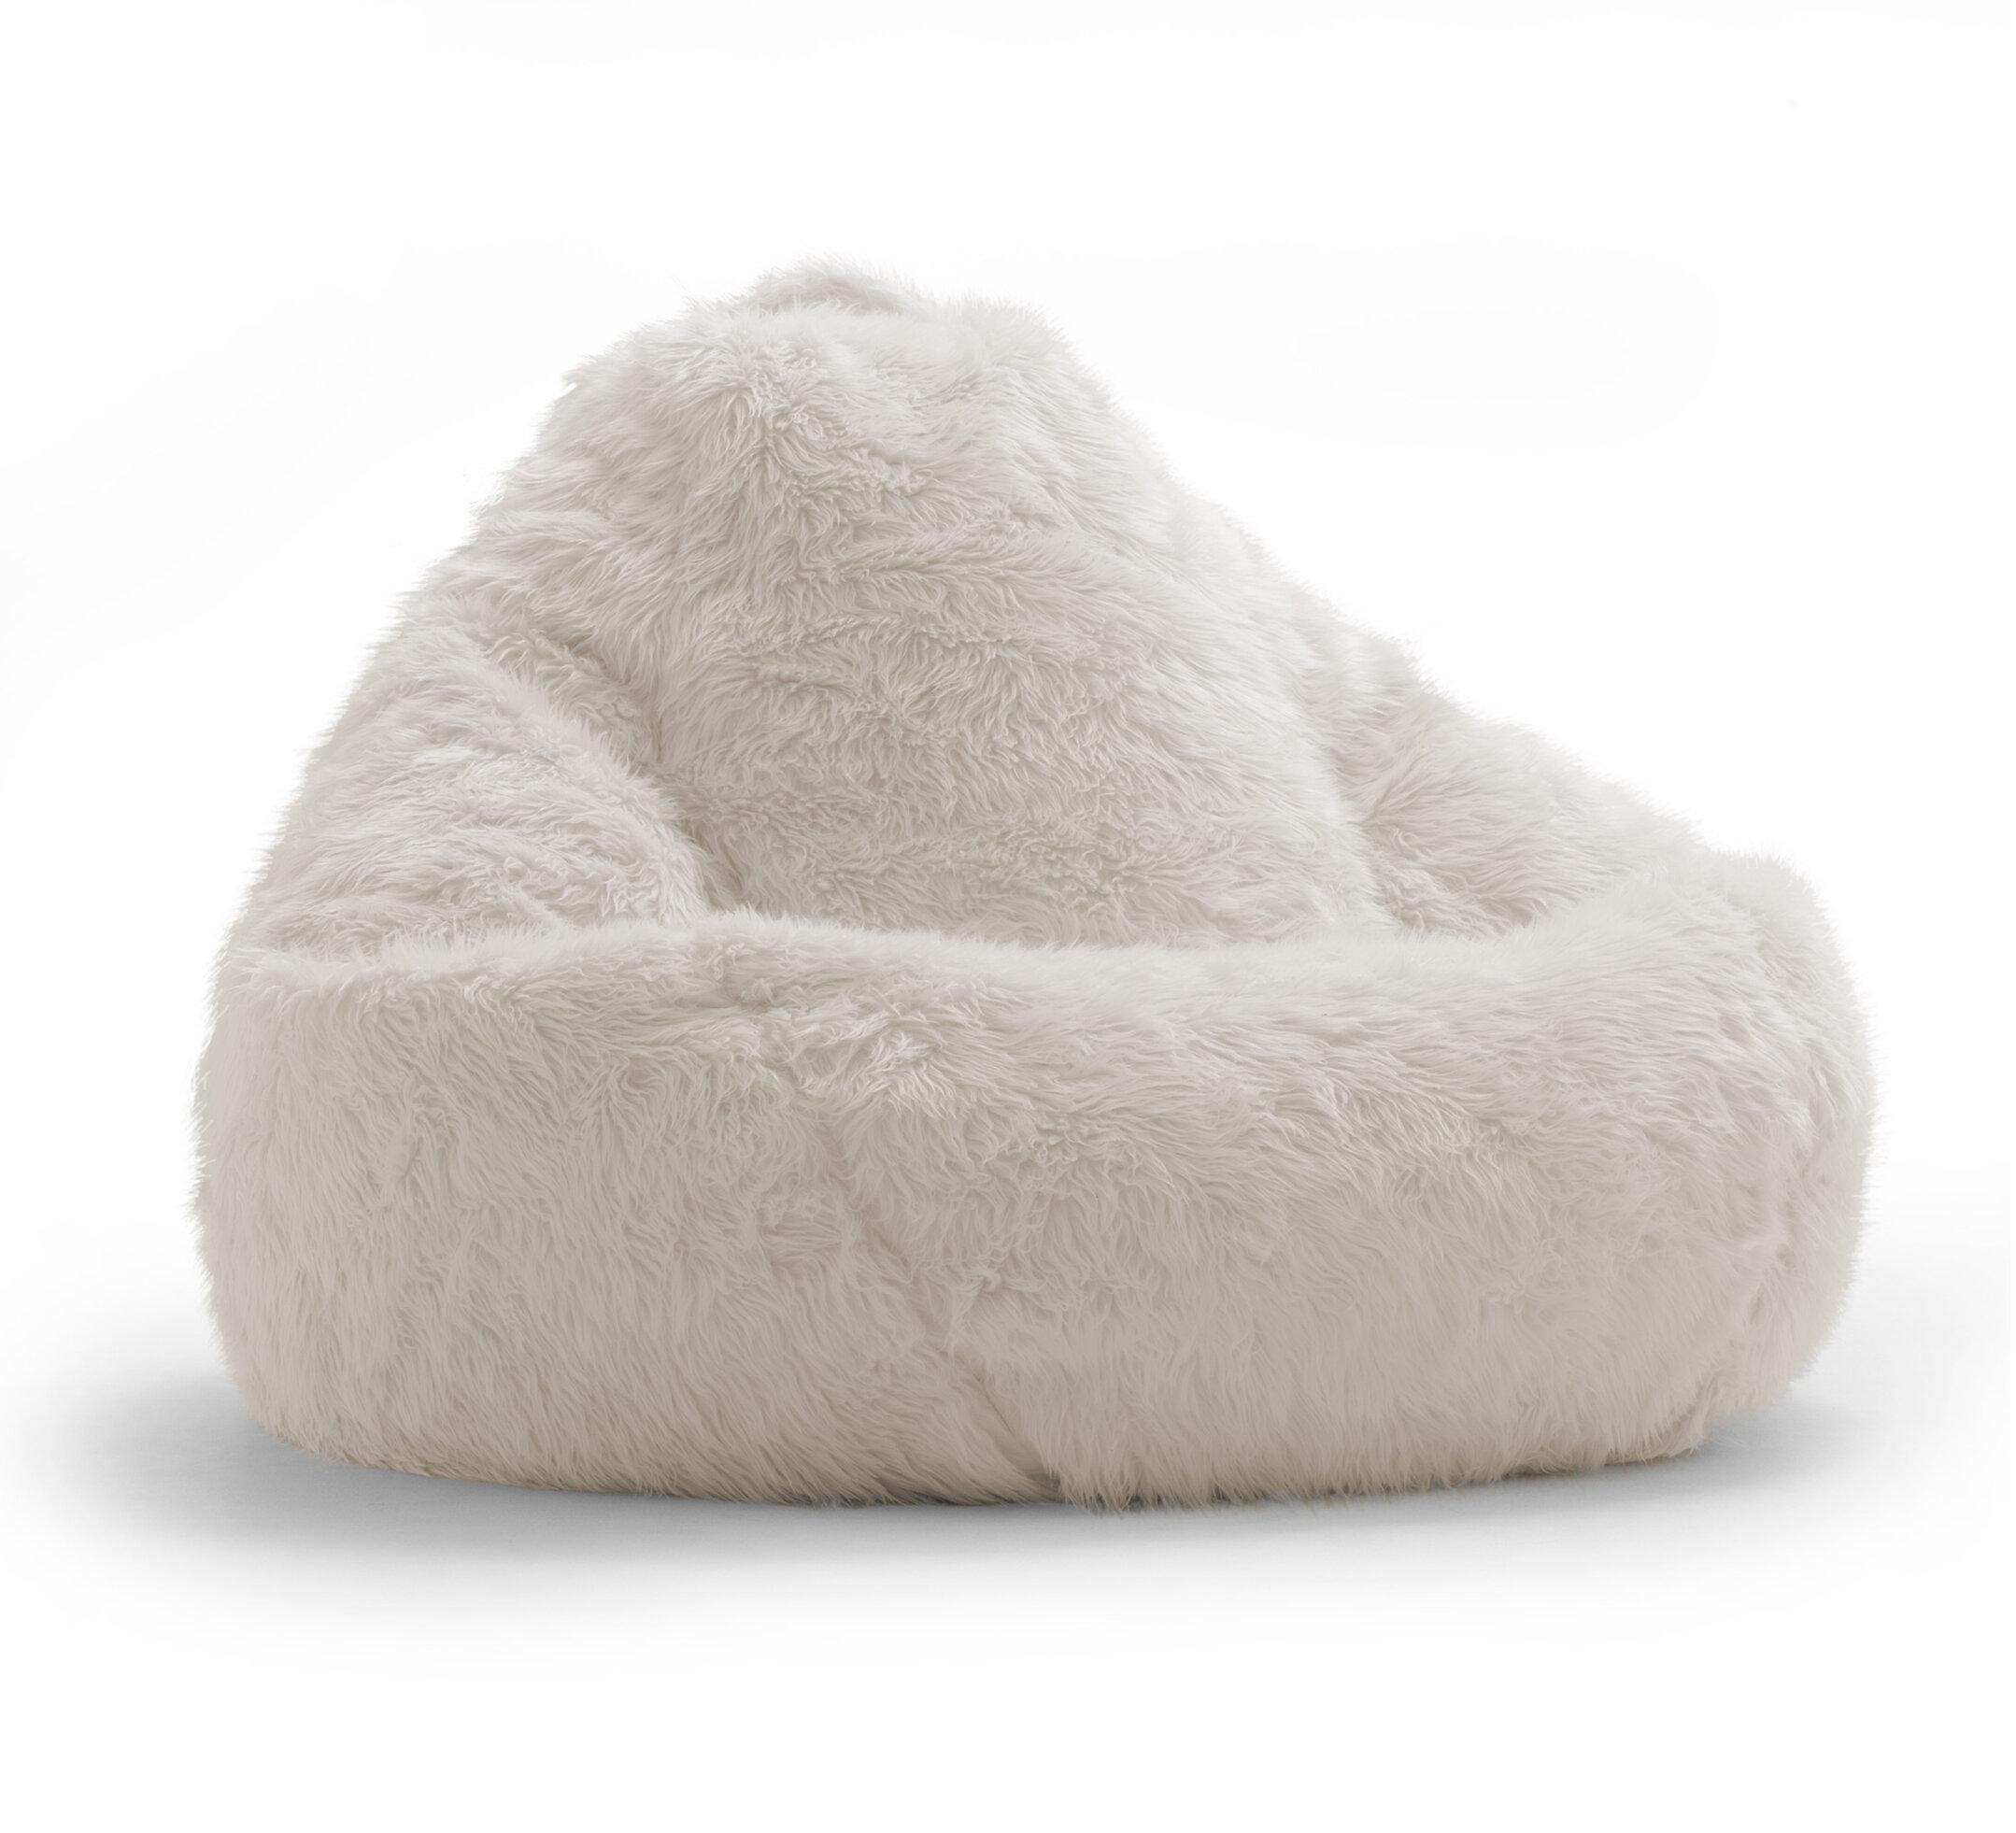 Picture of: Comfort Research Big Joe Large Bean Bag Chair Lounger Reviews Wayfair